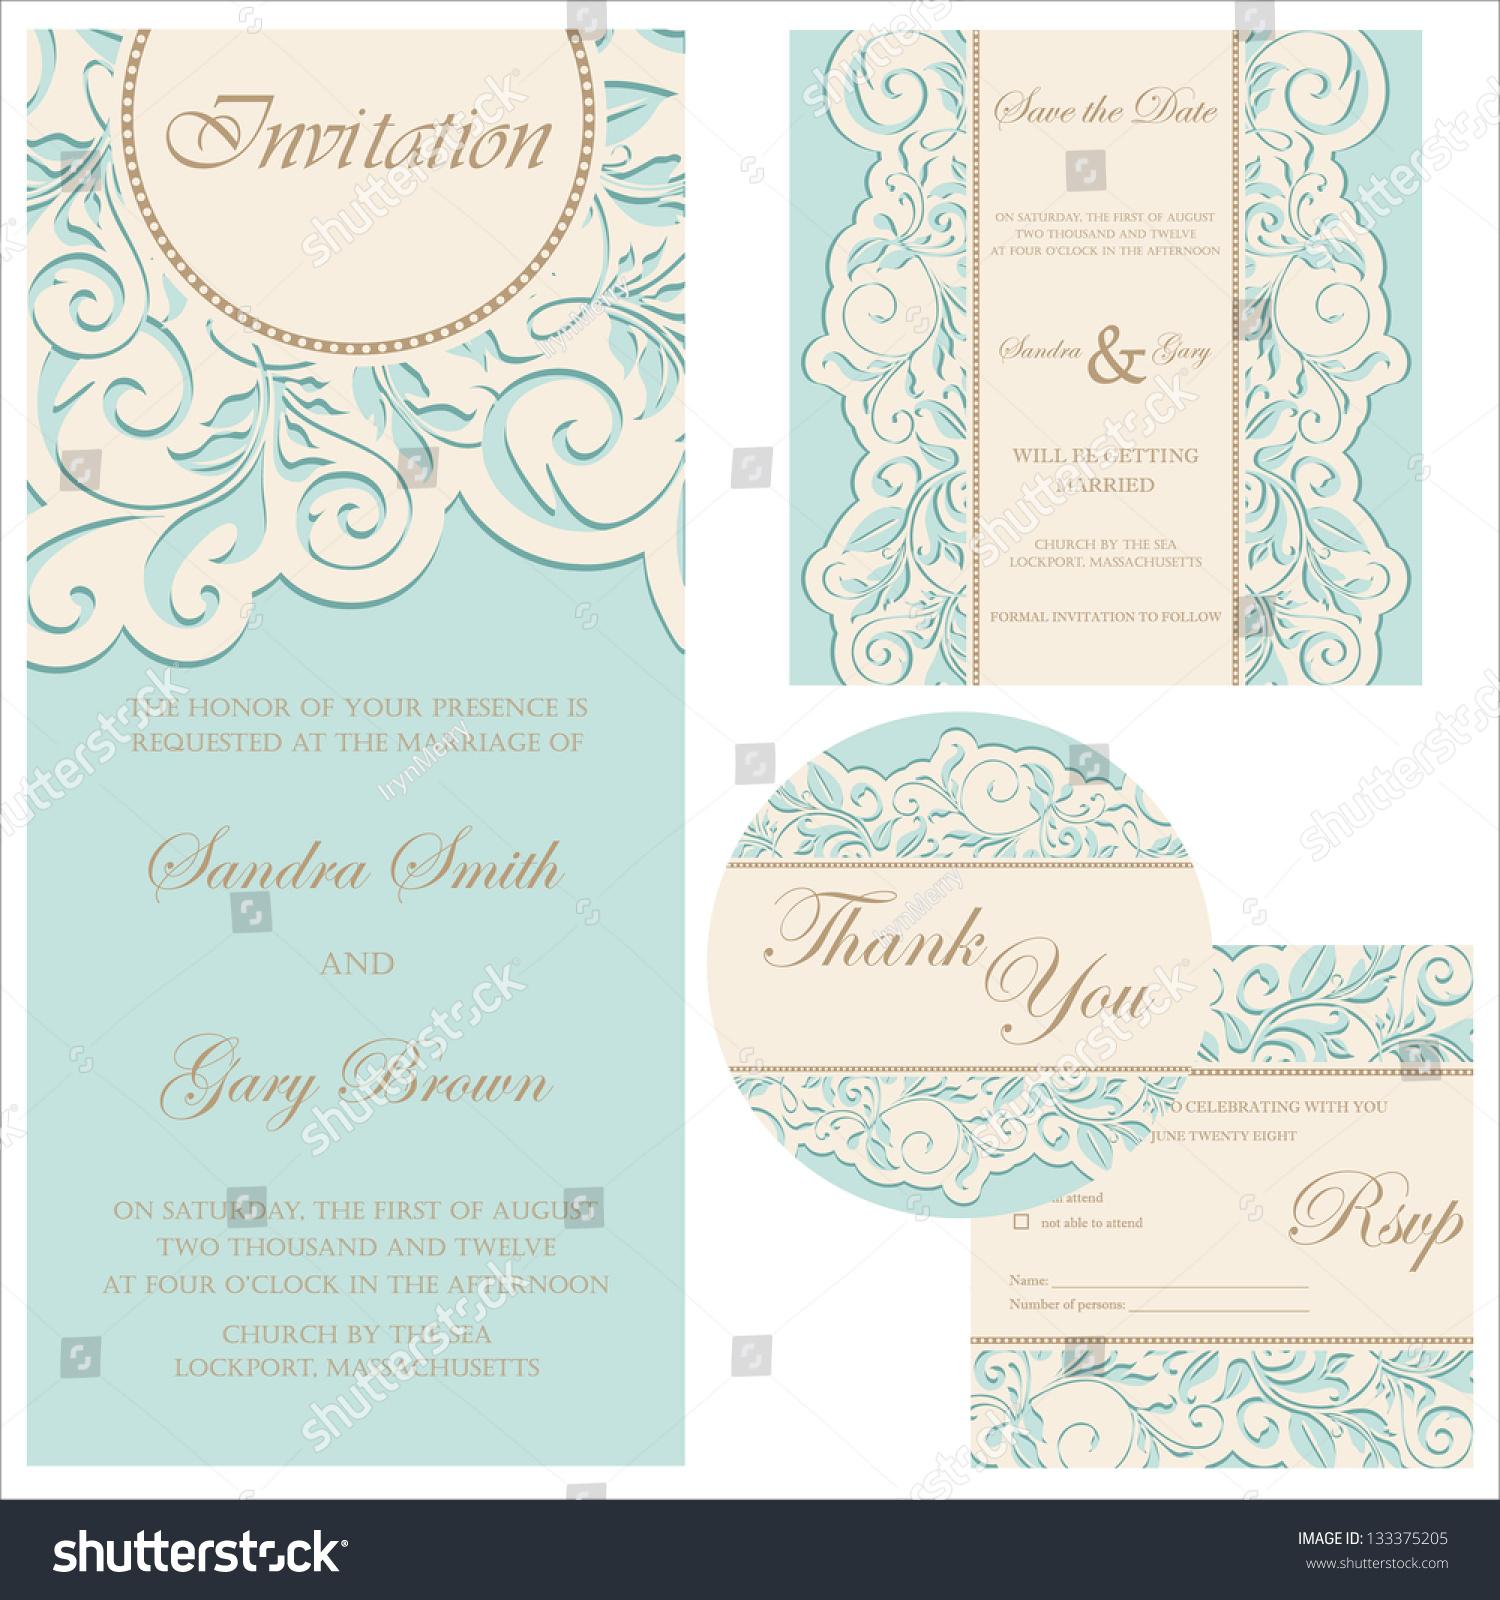 best wedding invitation cards templates wedding card invitation Unique Wedding Invitation Cards Designs Vertabox